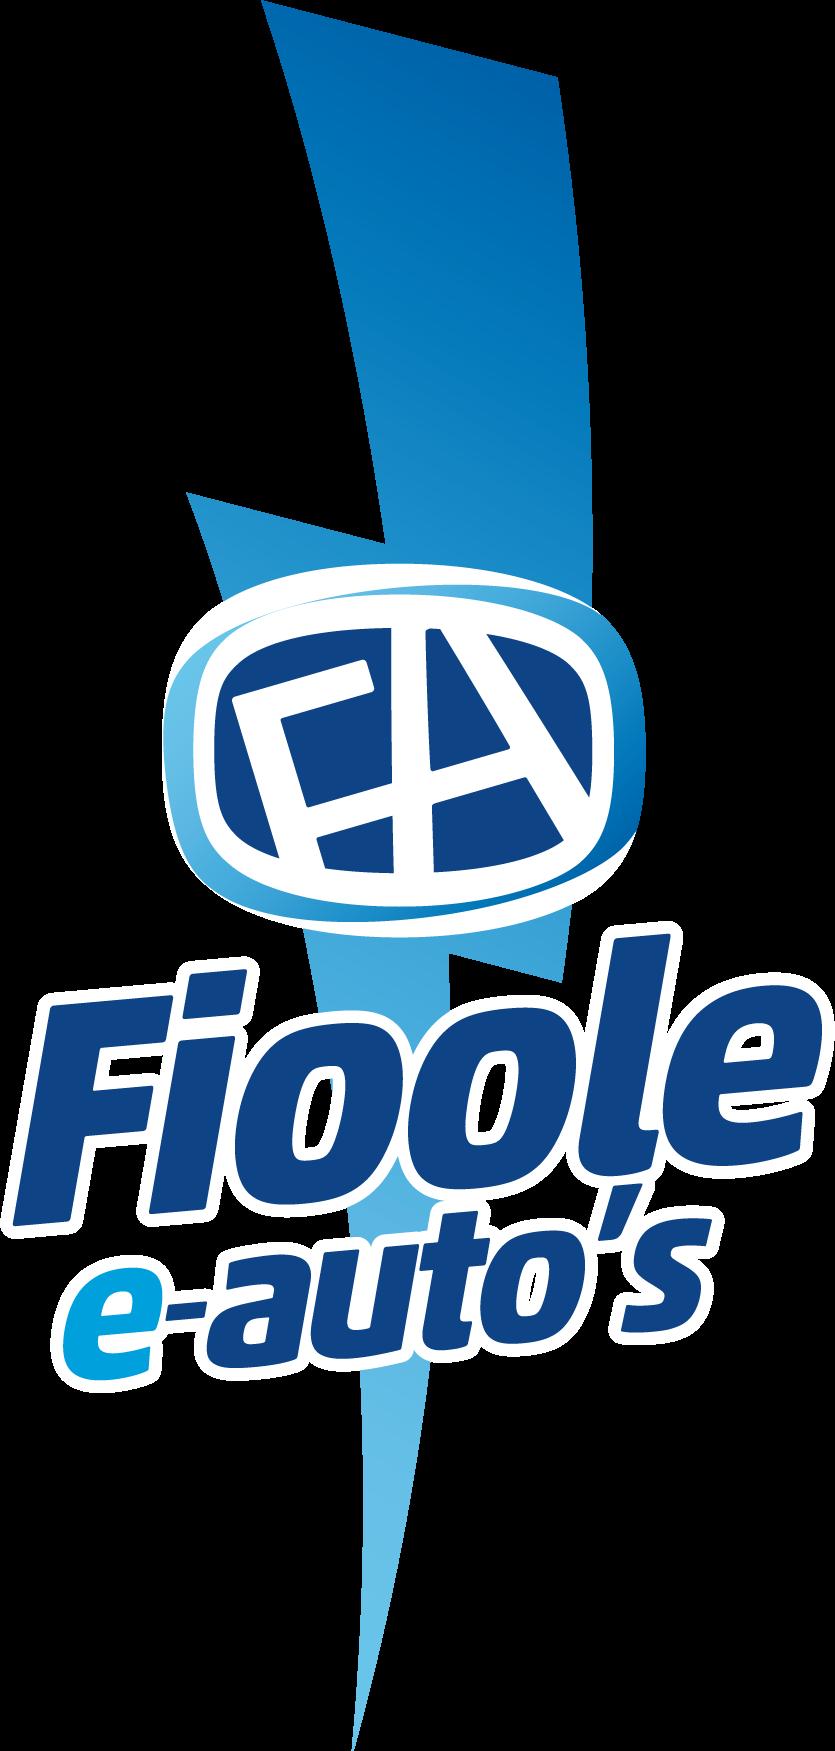 Logo Fioole e-autos